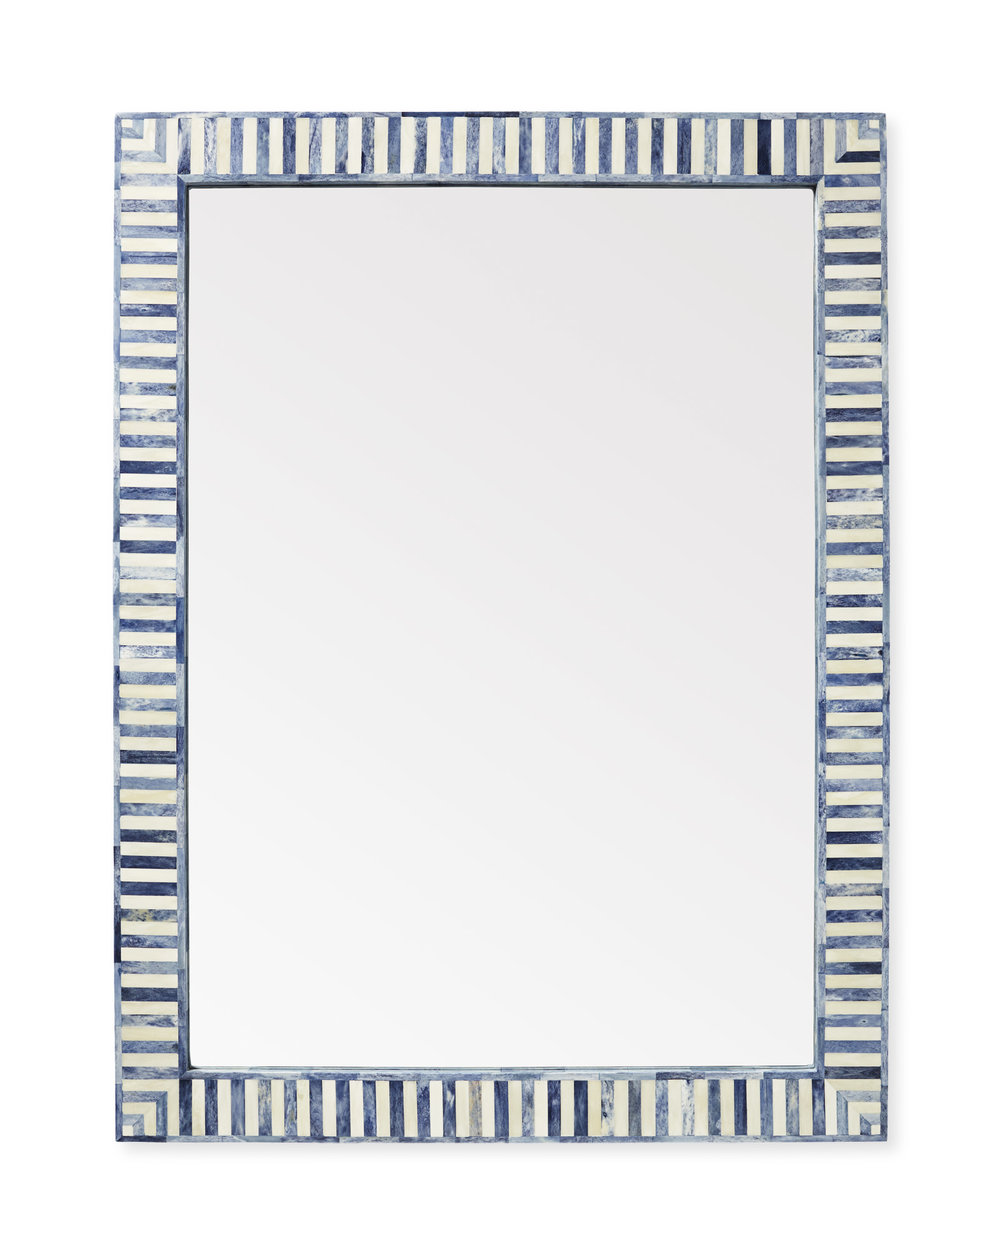 Mirror_Striped_Bone_Inlay_Large_Blue_MV_0421_Crop_SH.jpg